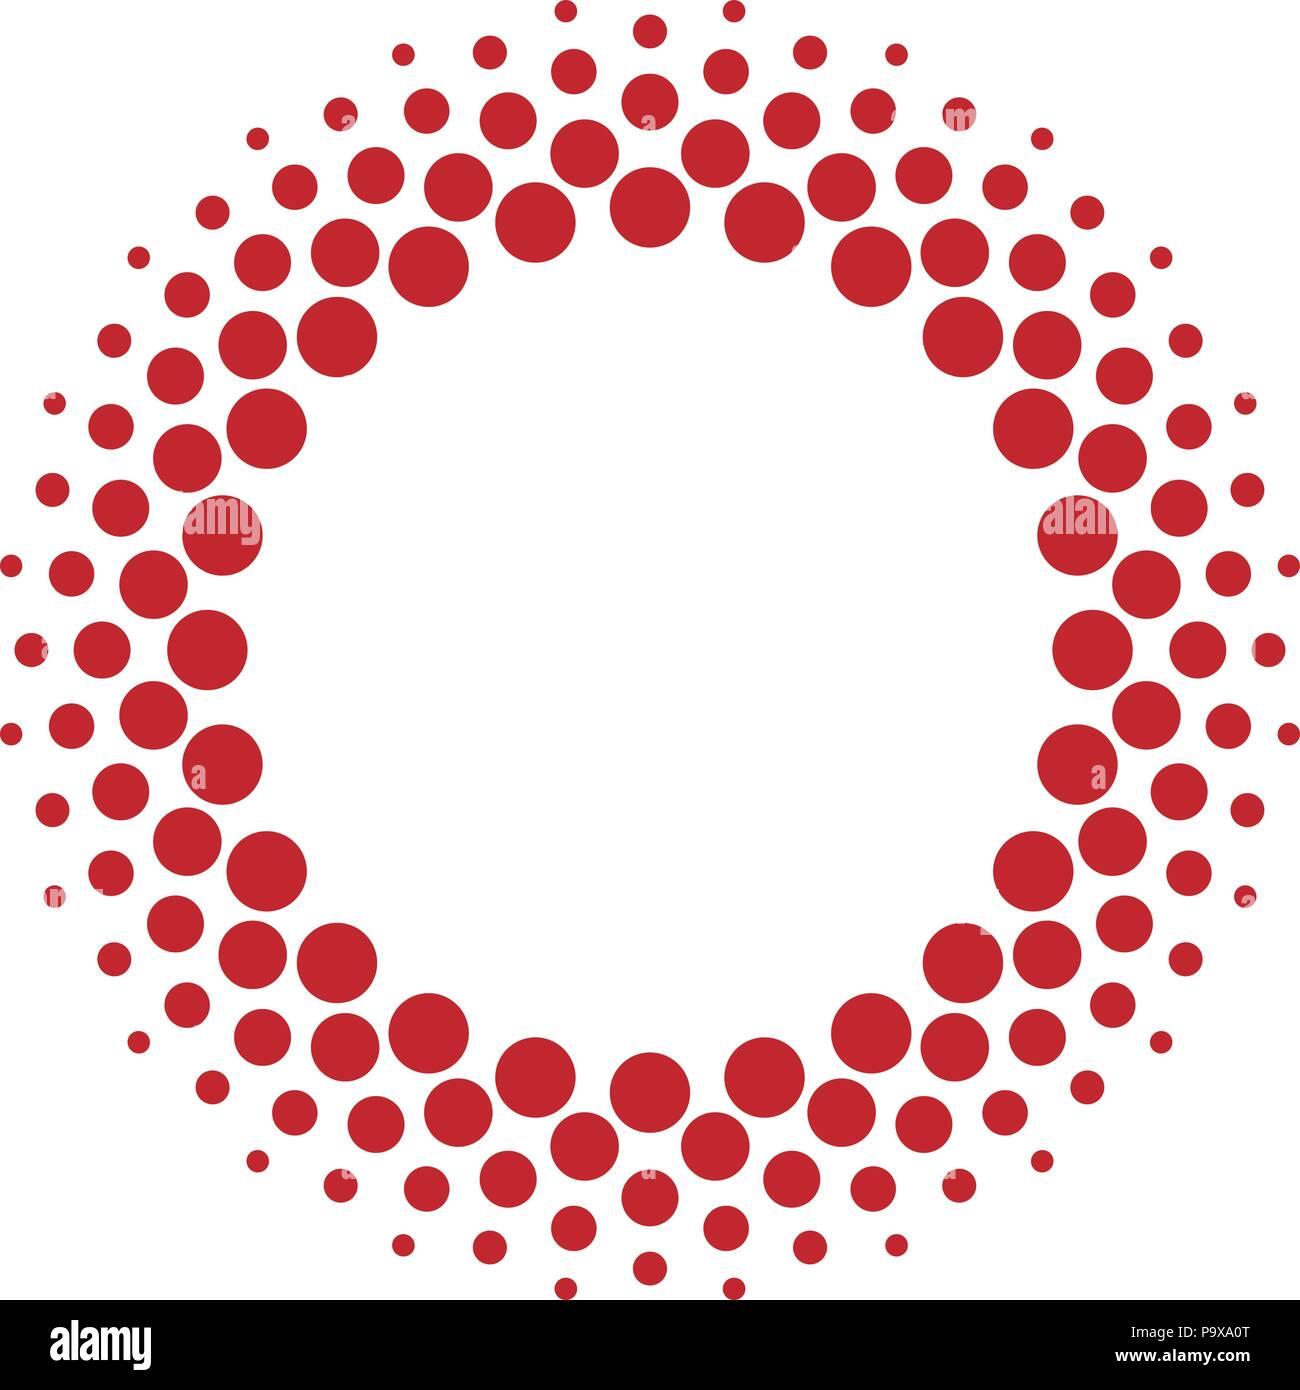 Halftone vector circle frame dots - Stock Image